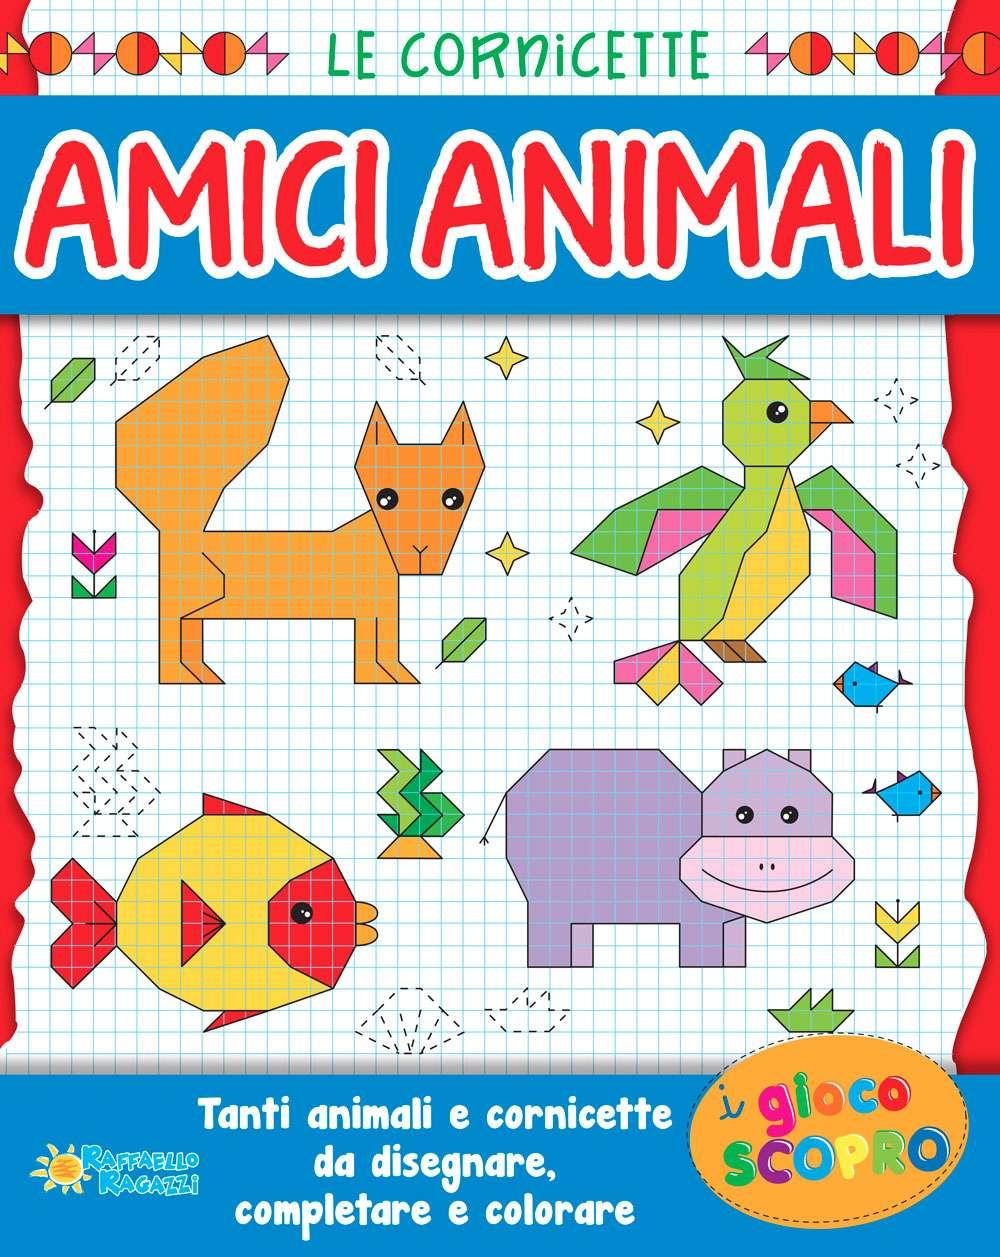 Le cornicette - Amici animali